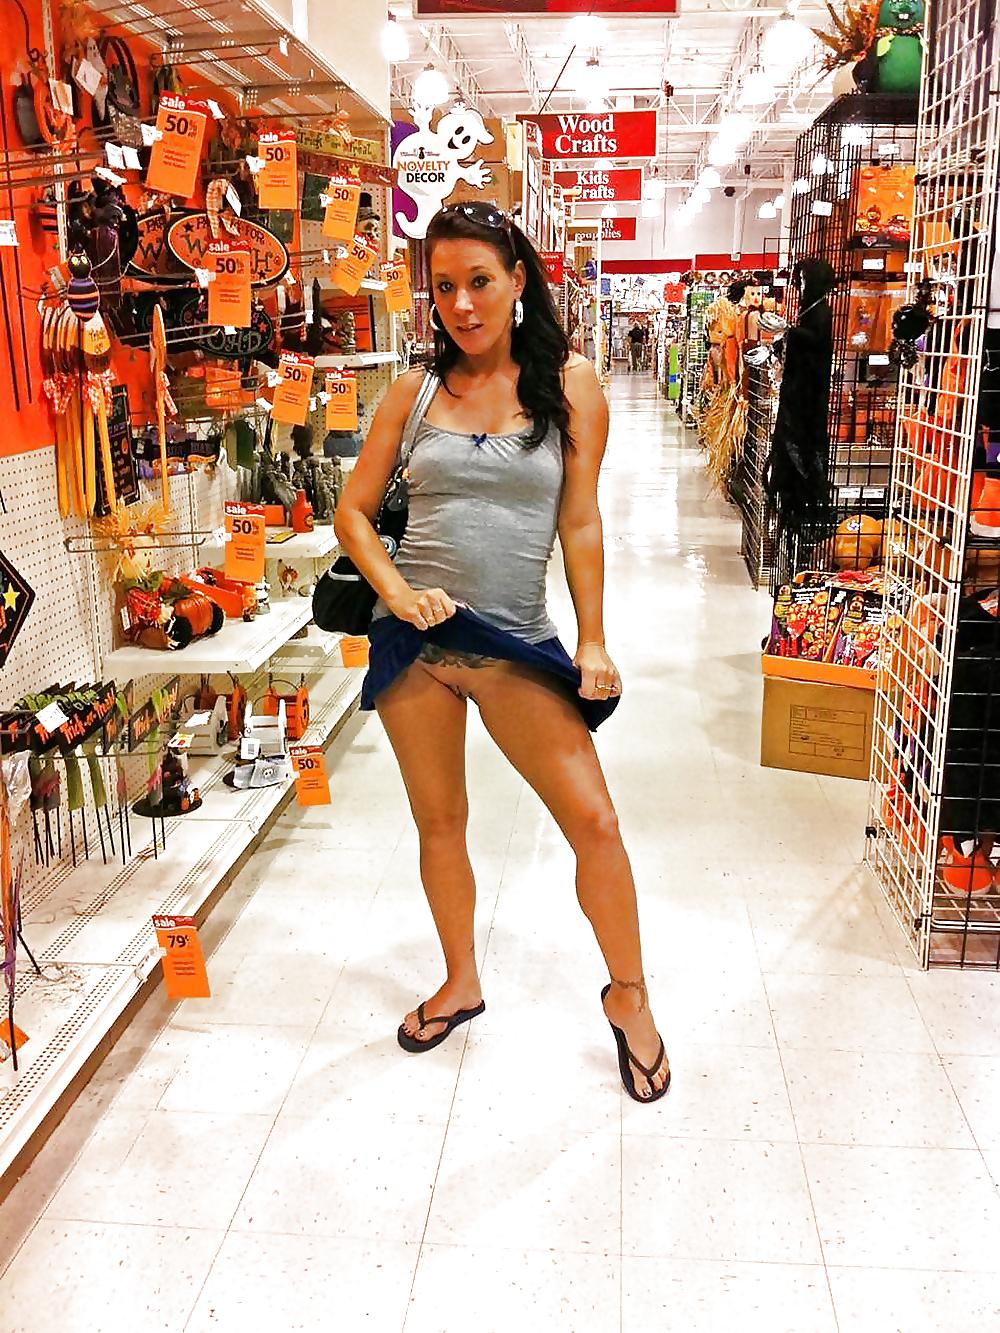 girl-fuck-naked-women-at-stores-fucking-hard